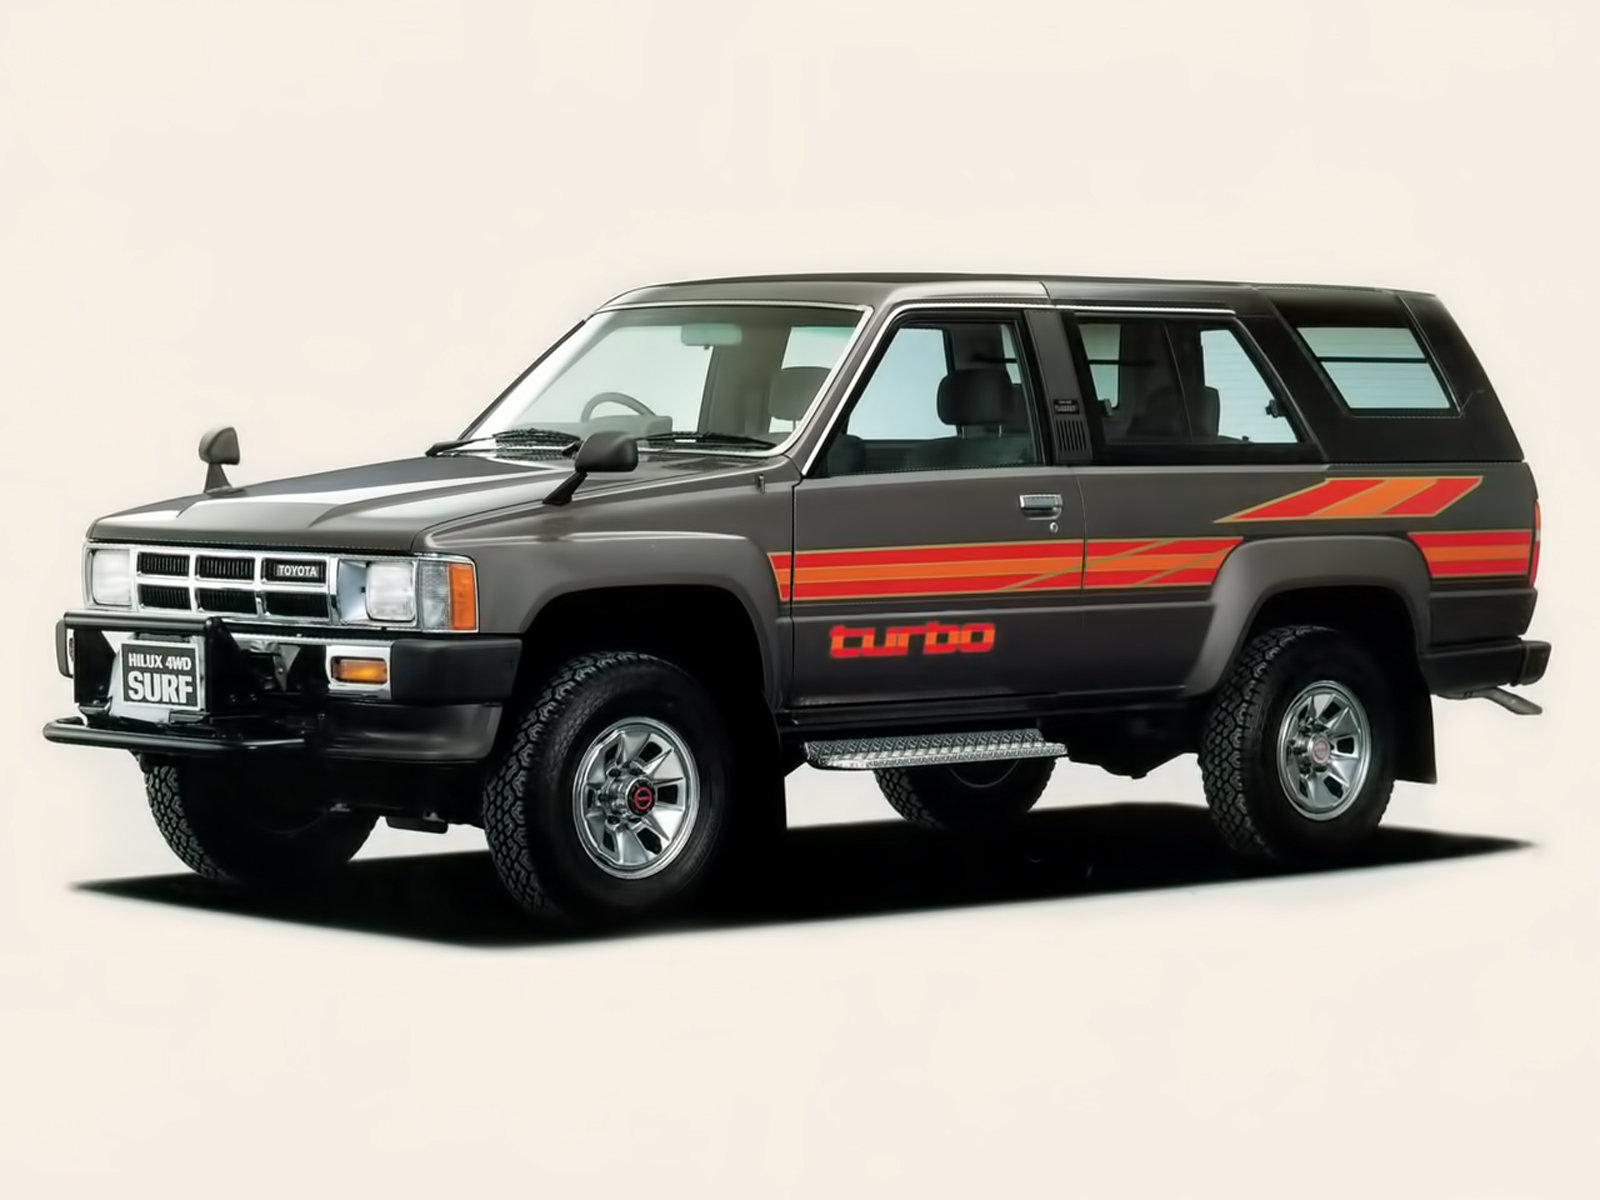 Toyota Hilux Surf I 1984 - 1989 SUV 3 door #3